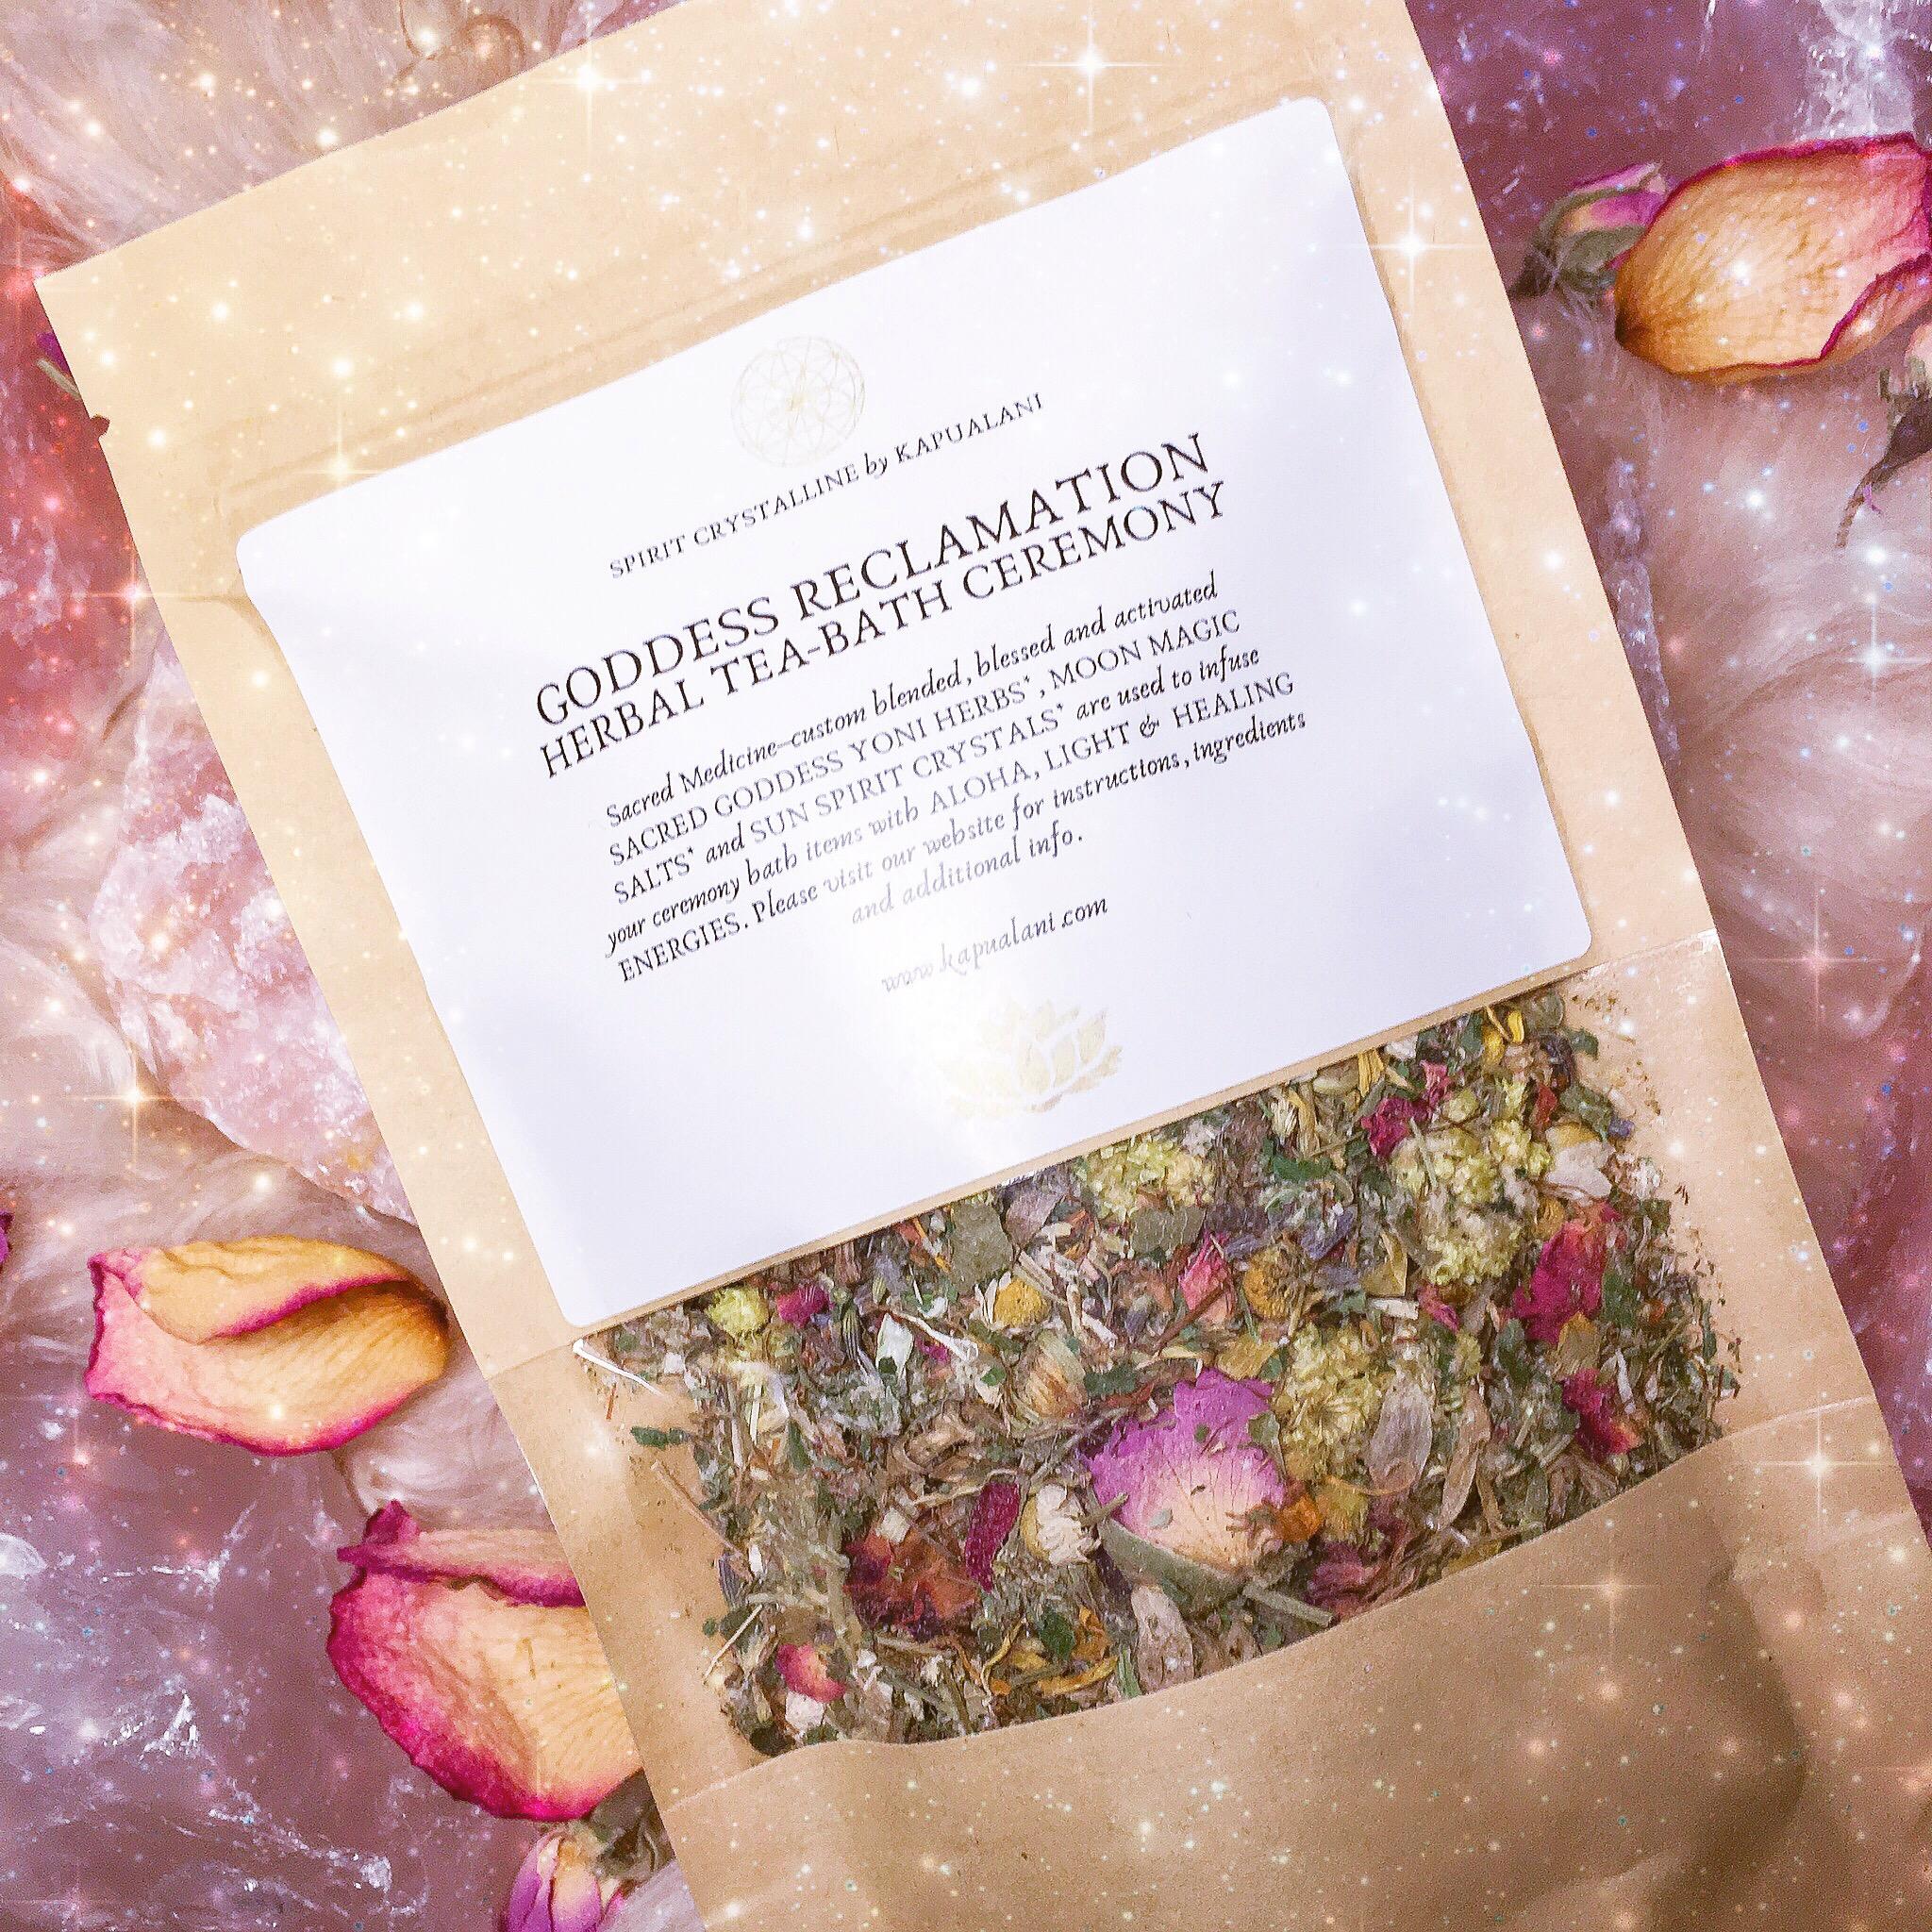 GODDESS RECLAMATION: Herbal Tea-Bath Ceremony Kit